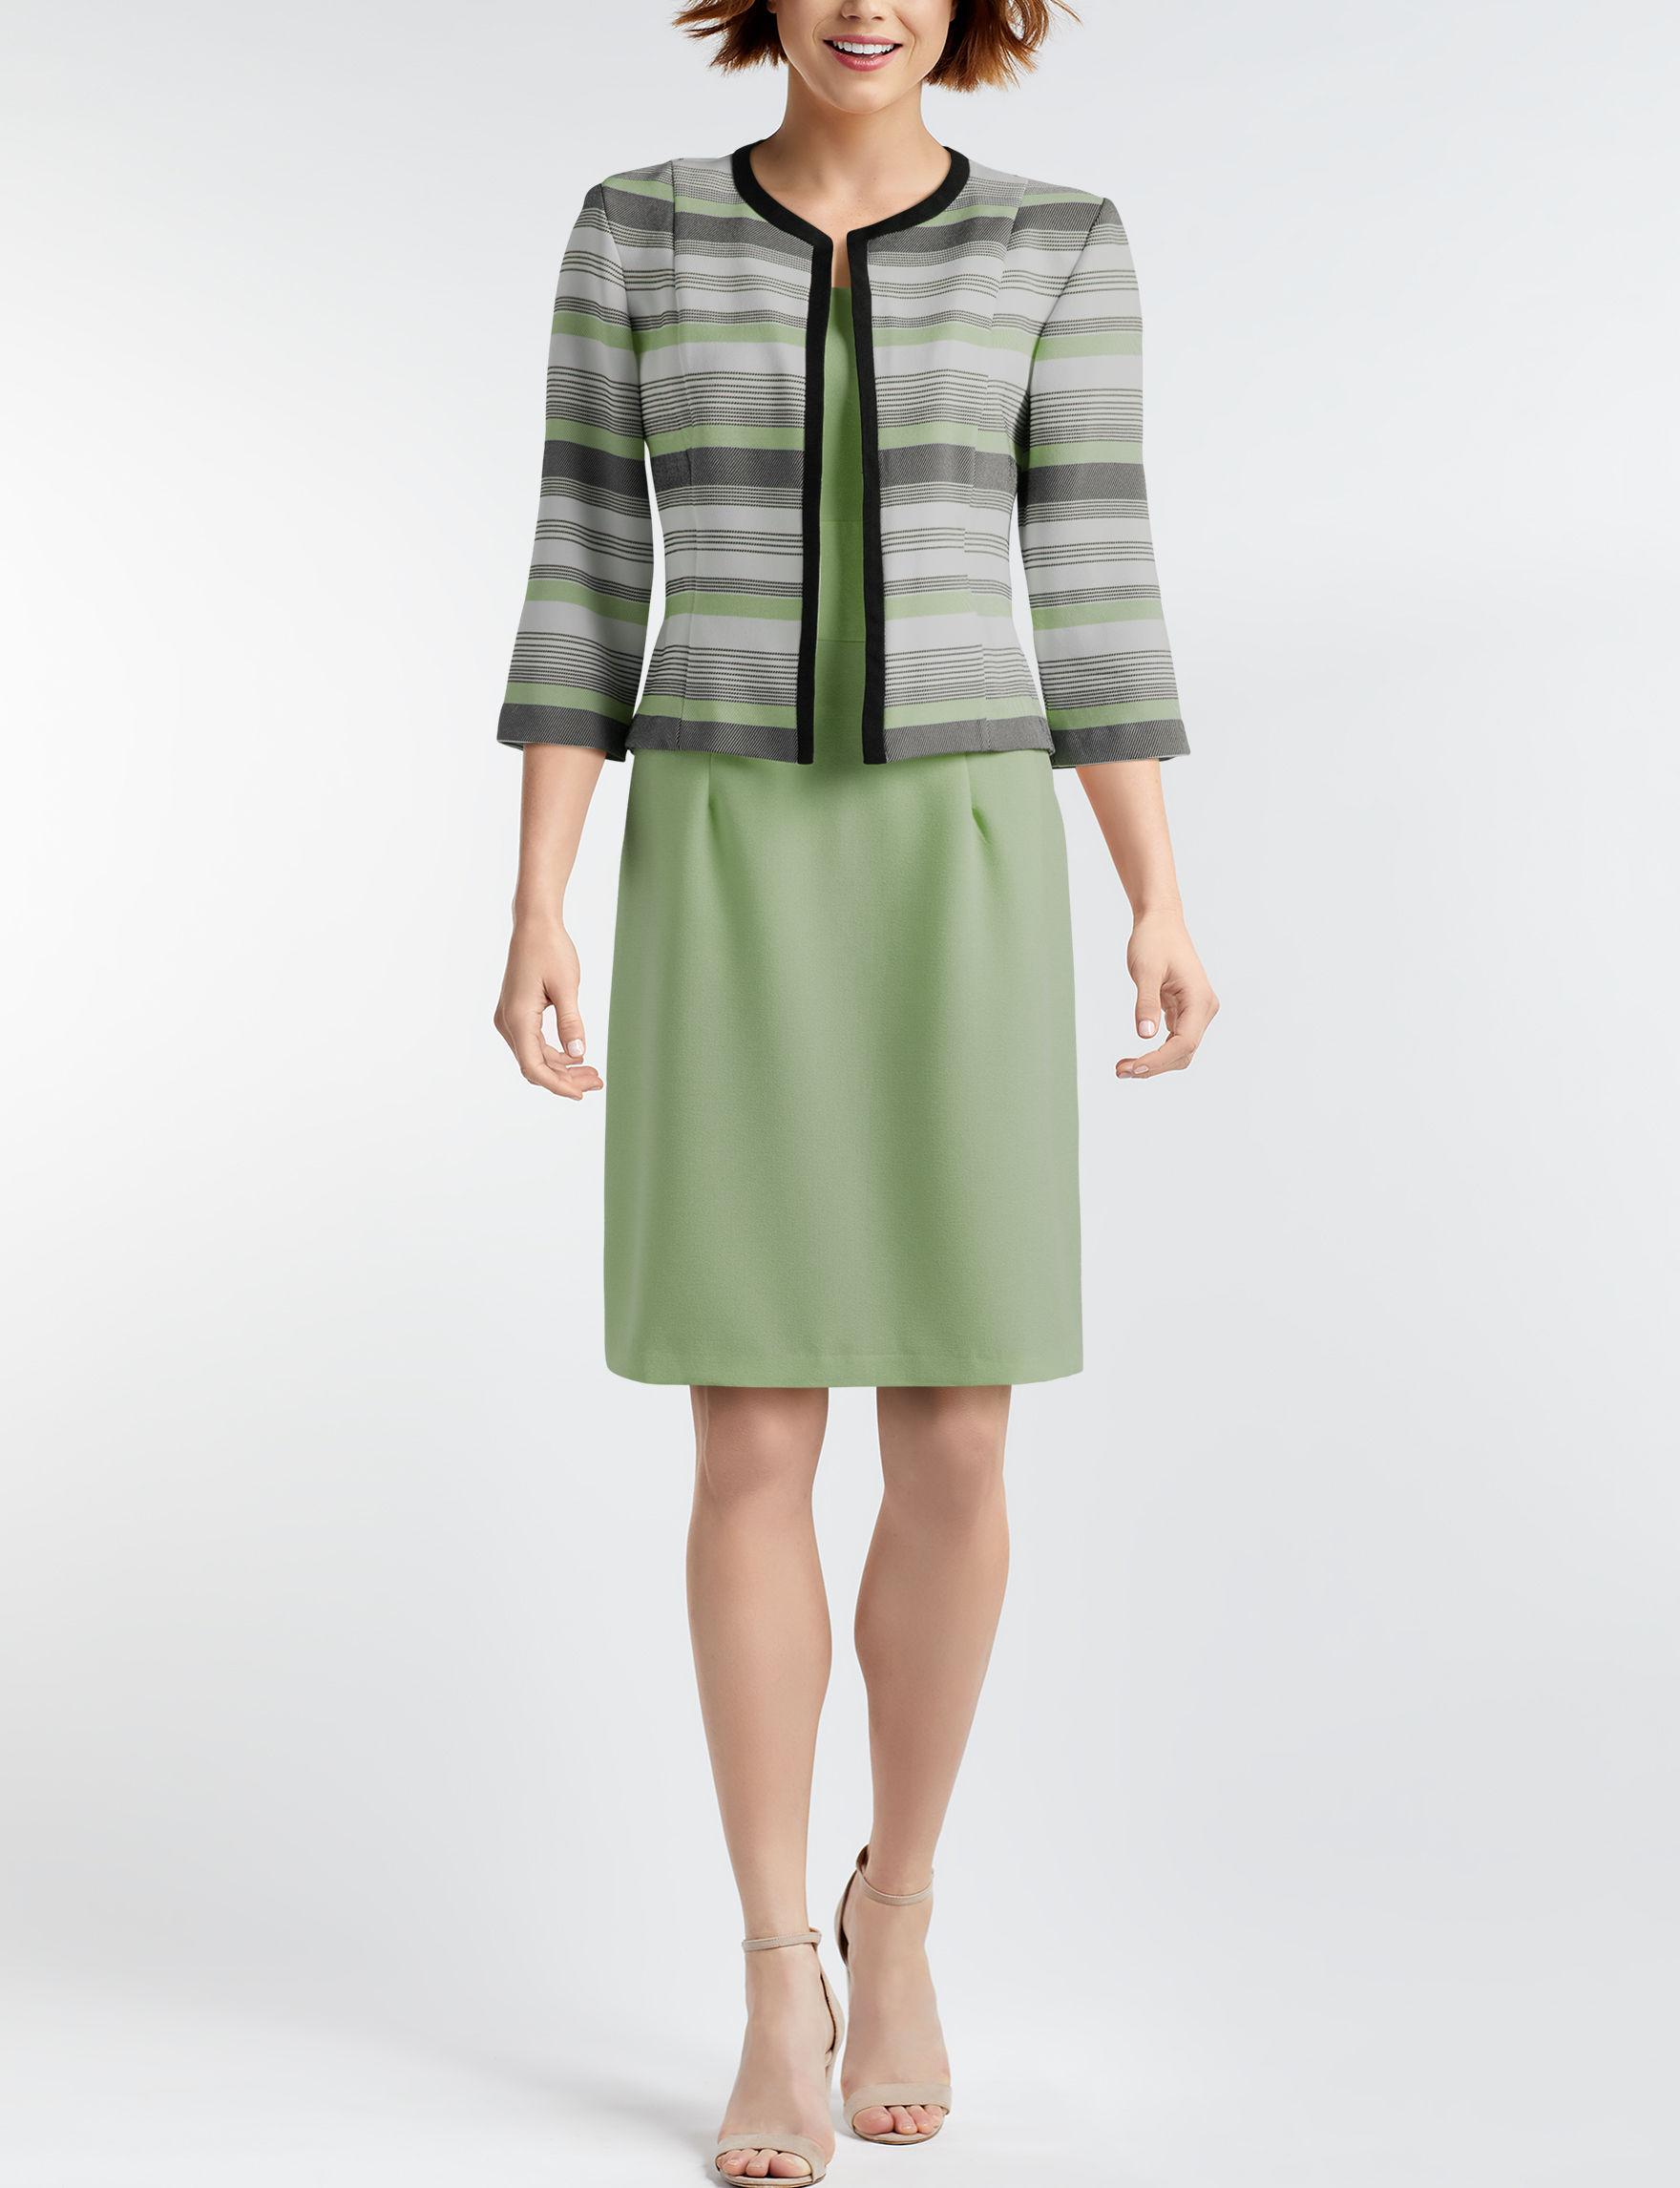 Nina Leonard Green Multi Everyday & Casual Jacket Dresses